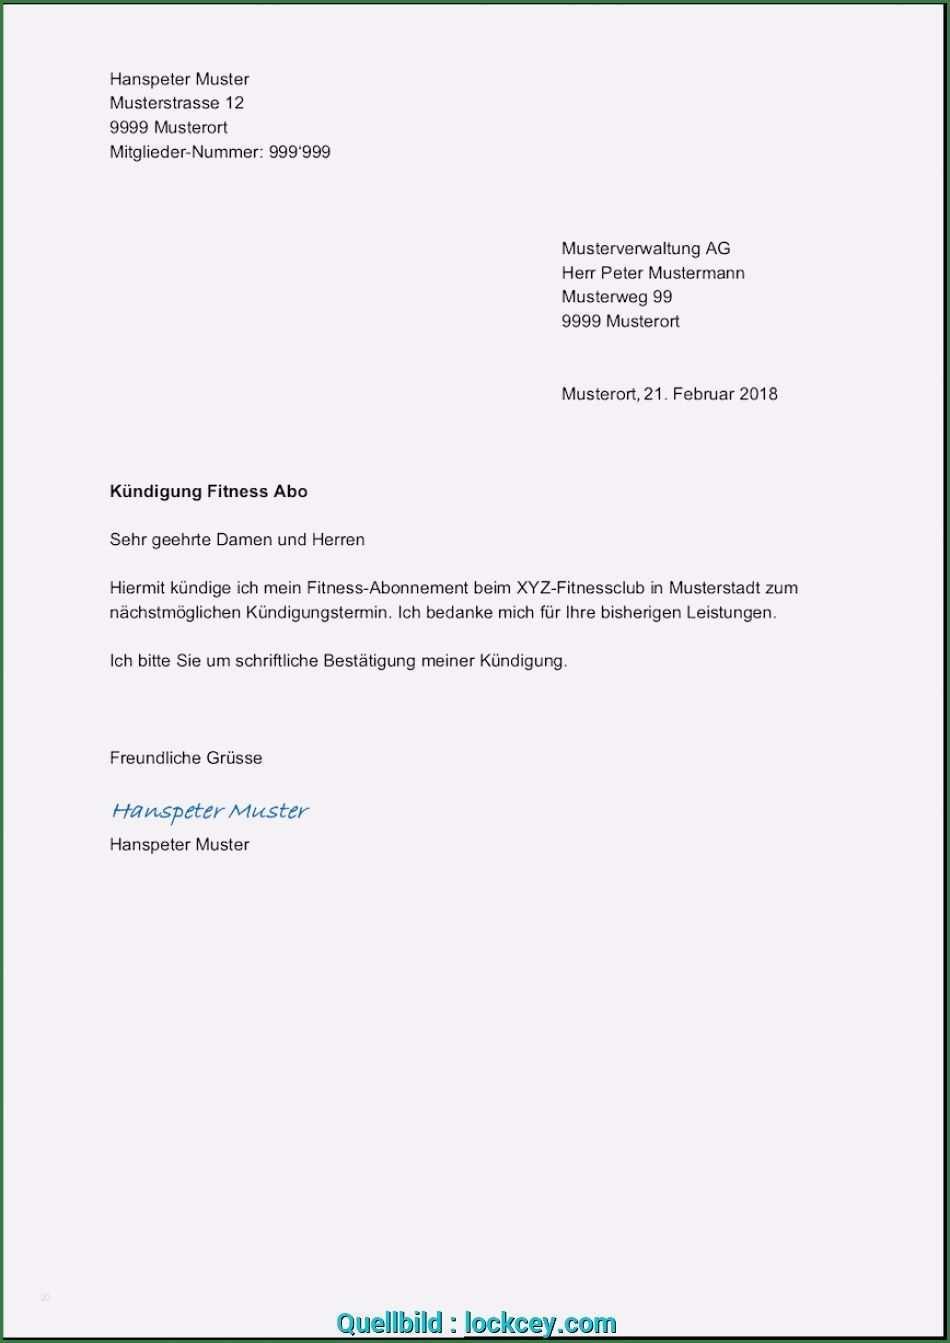 14 Wunderbar Kundigung Krankenkasse Familienversicherung Vorlage Vorlagen Word Vorlagen Kundigung